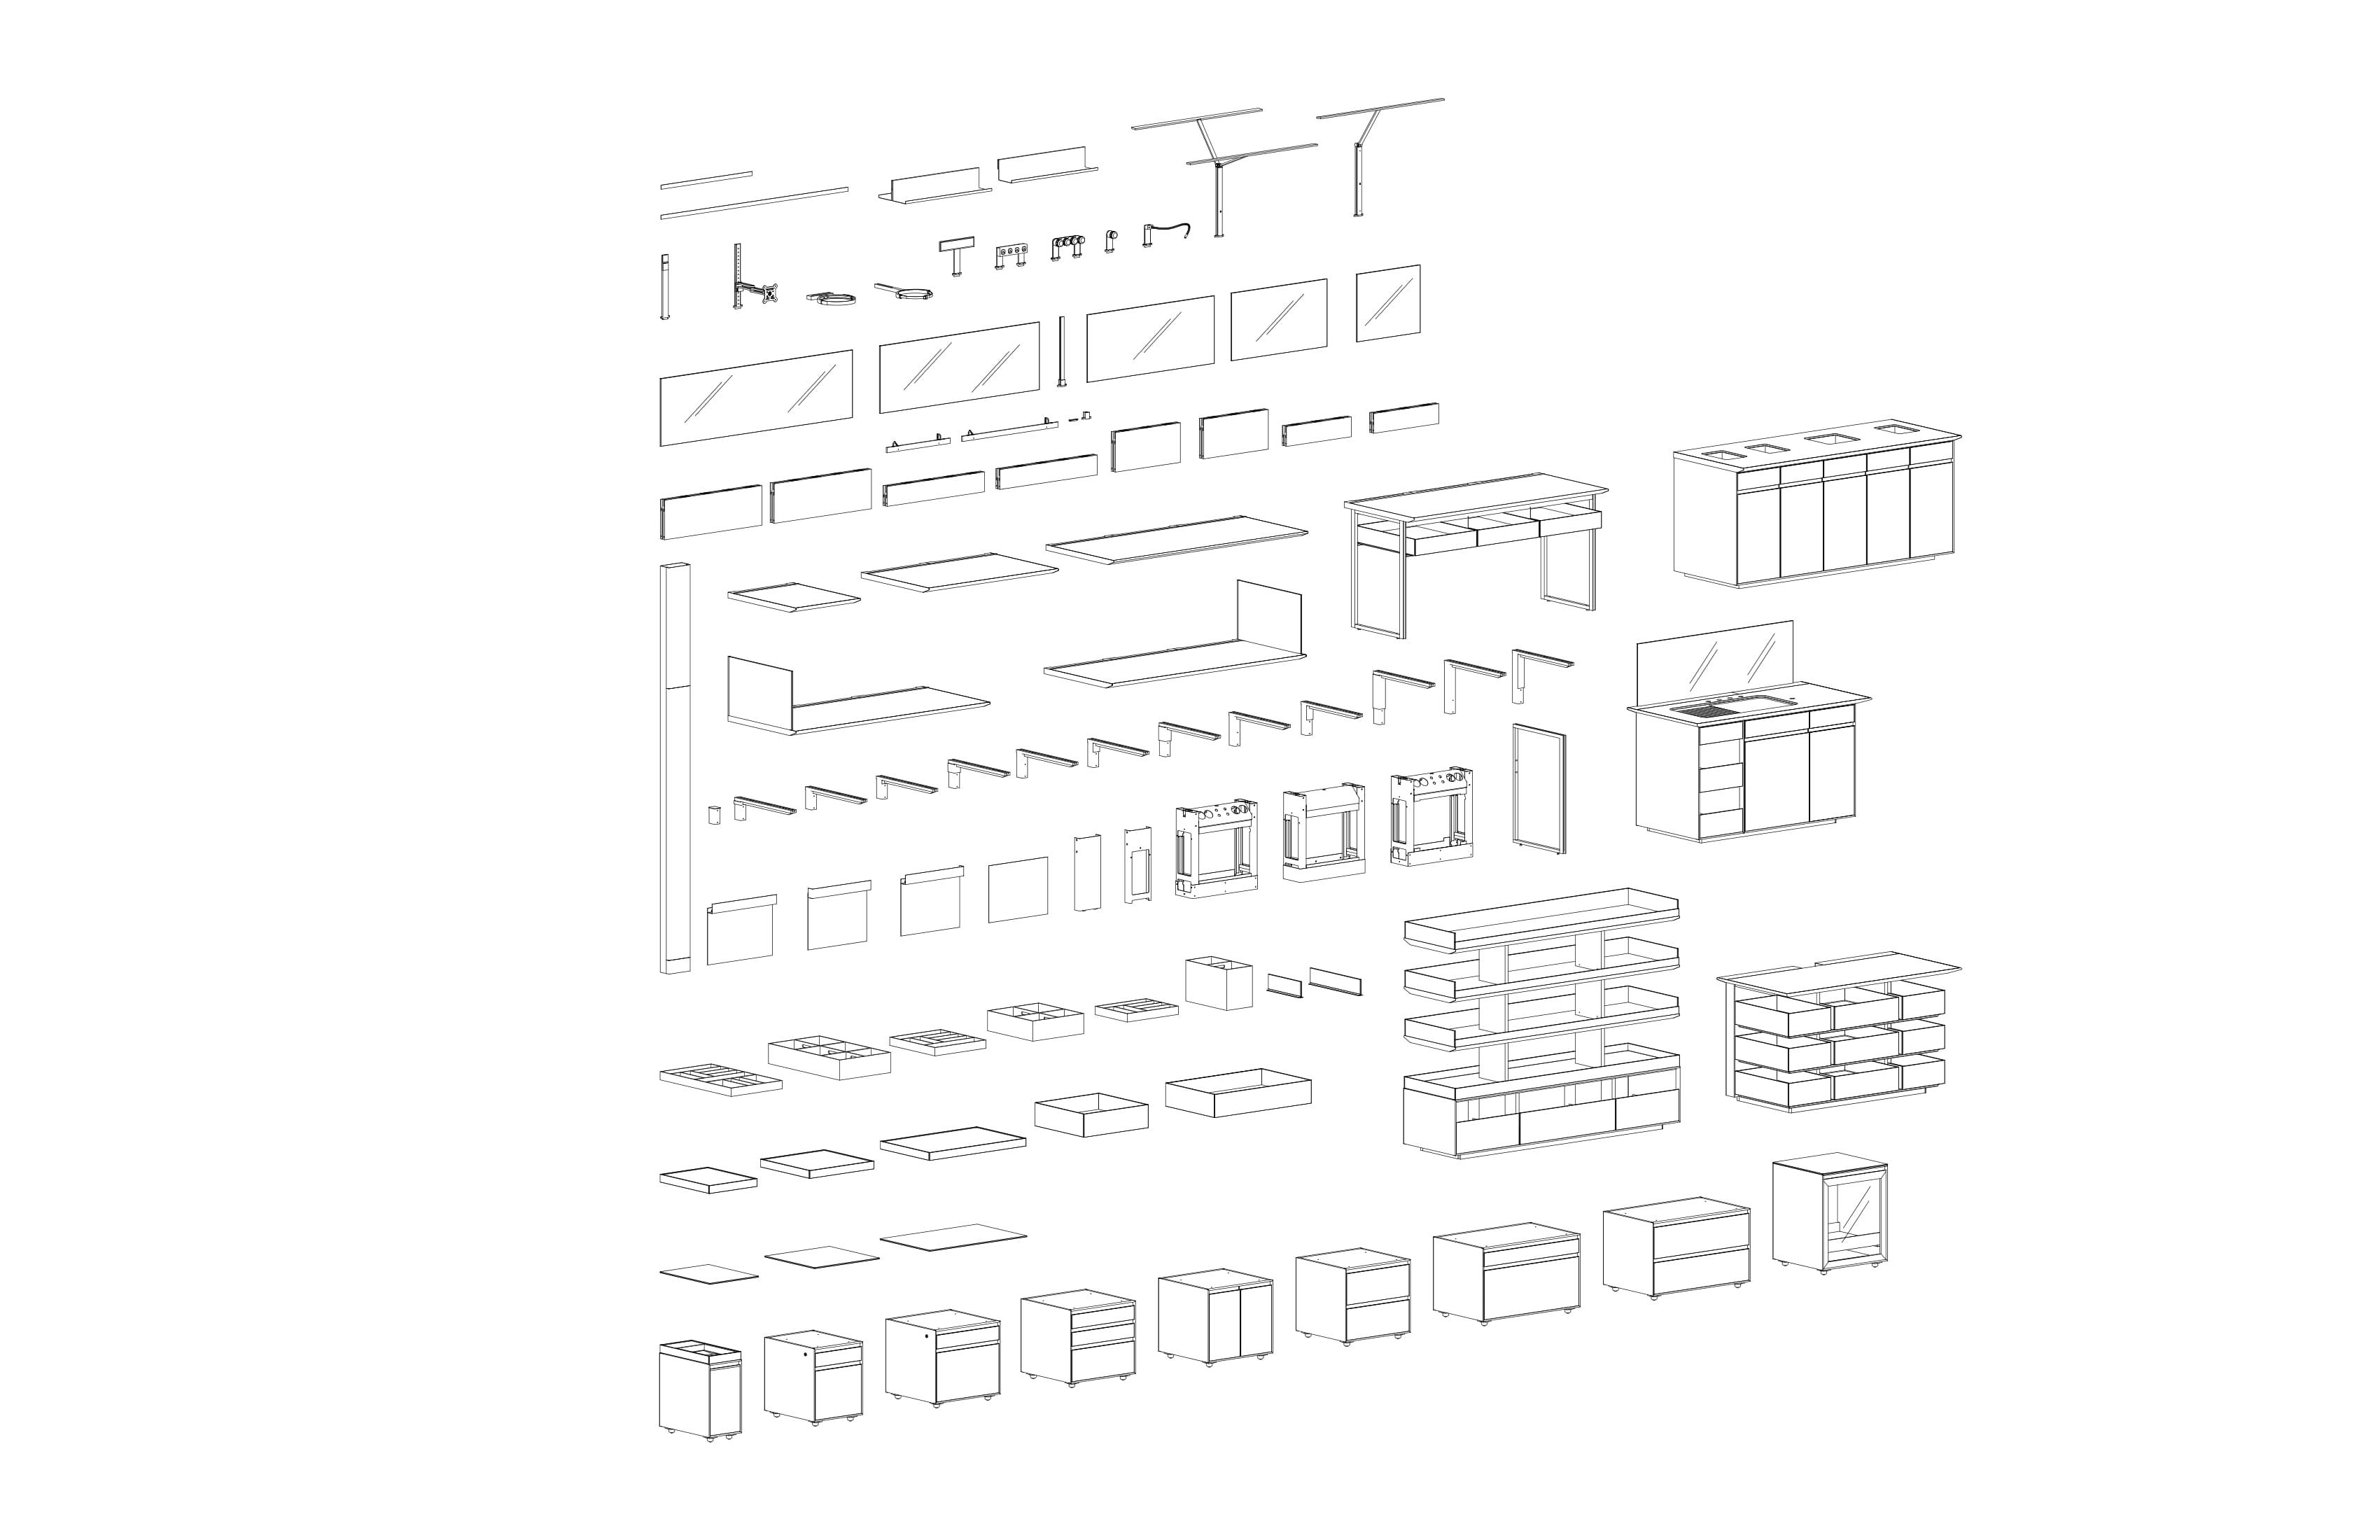 Furniture systems components Toshiko Mori Architect}